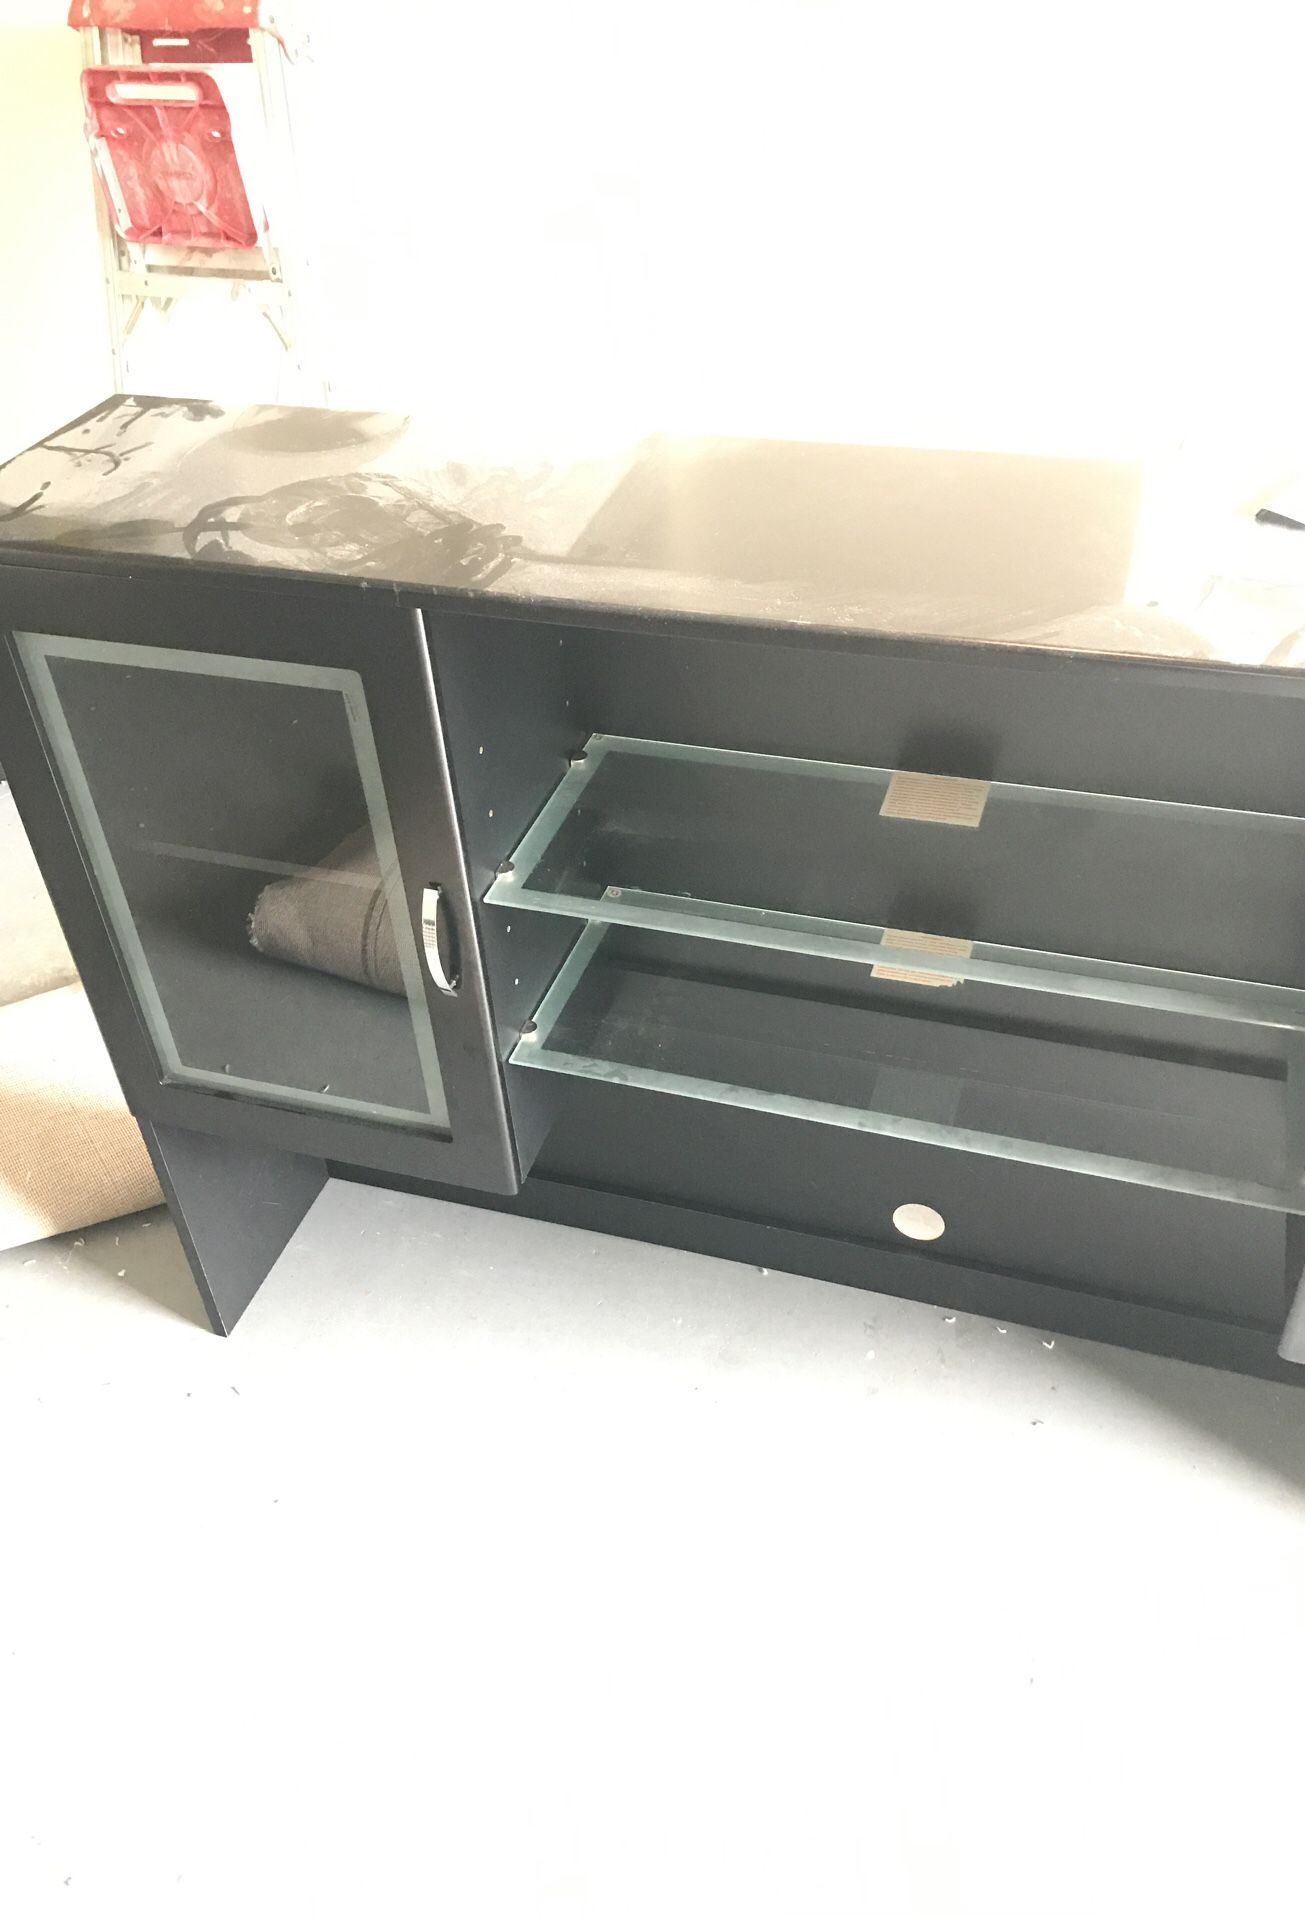 Nice desk forsale